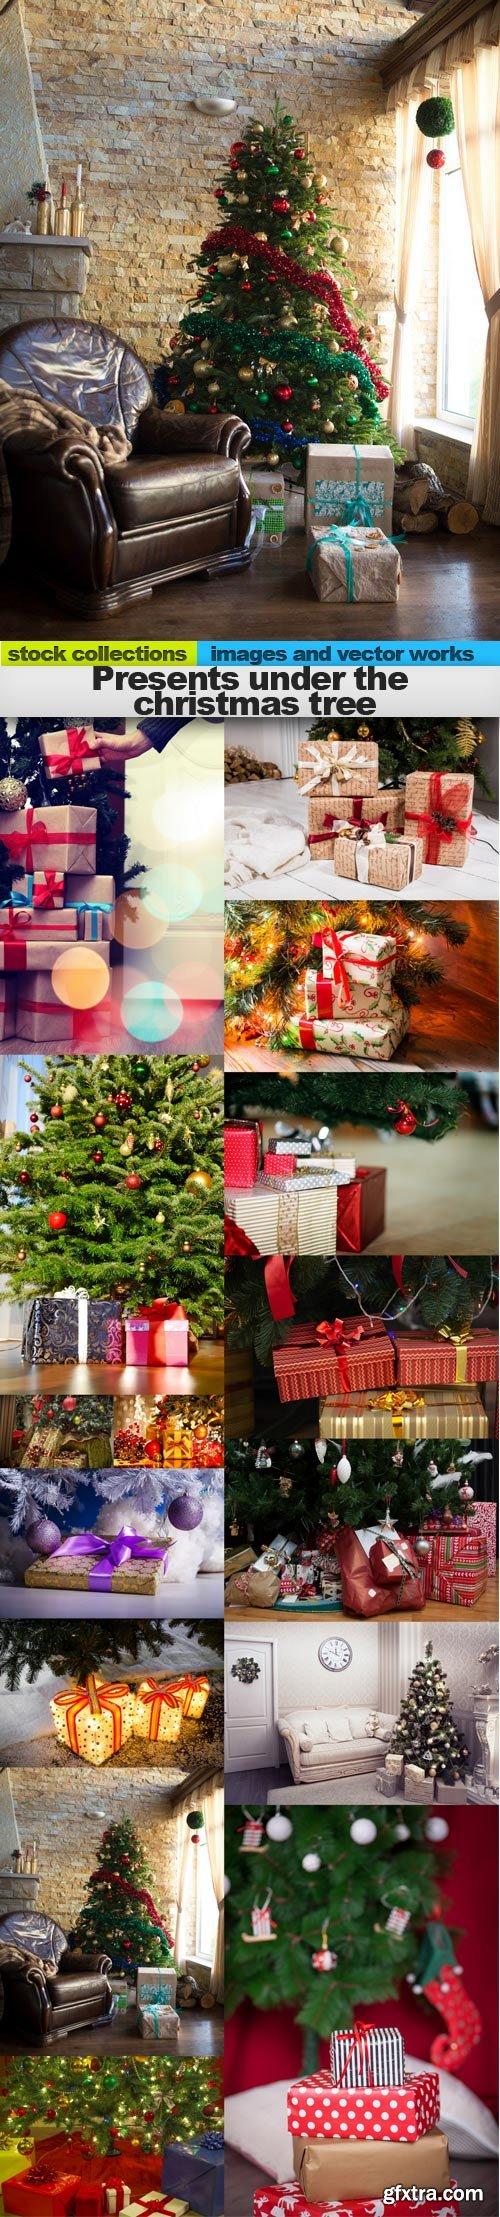 Presents under the christmas tree, 15 x UHQ JPEG